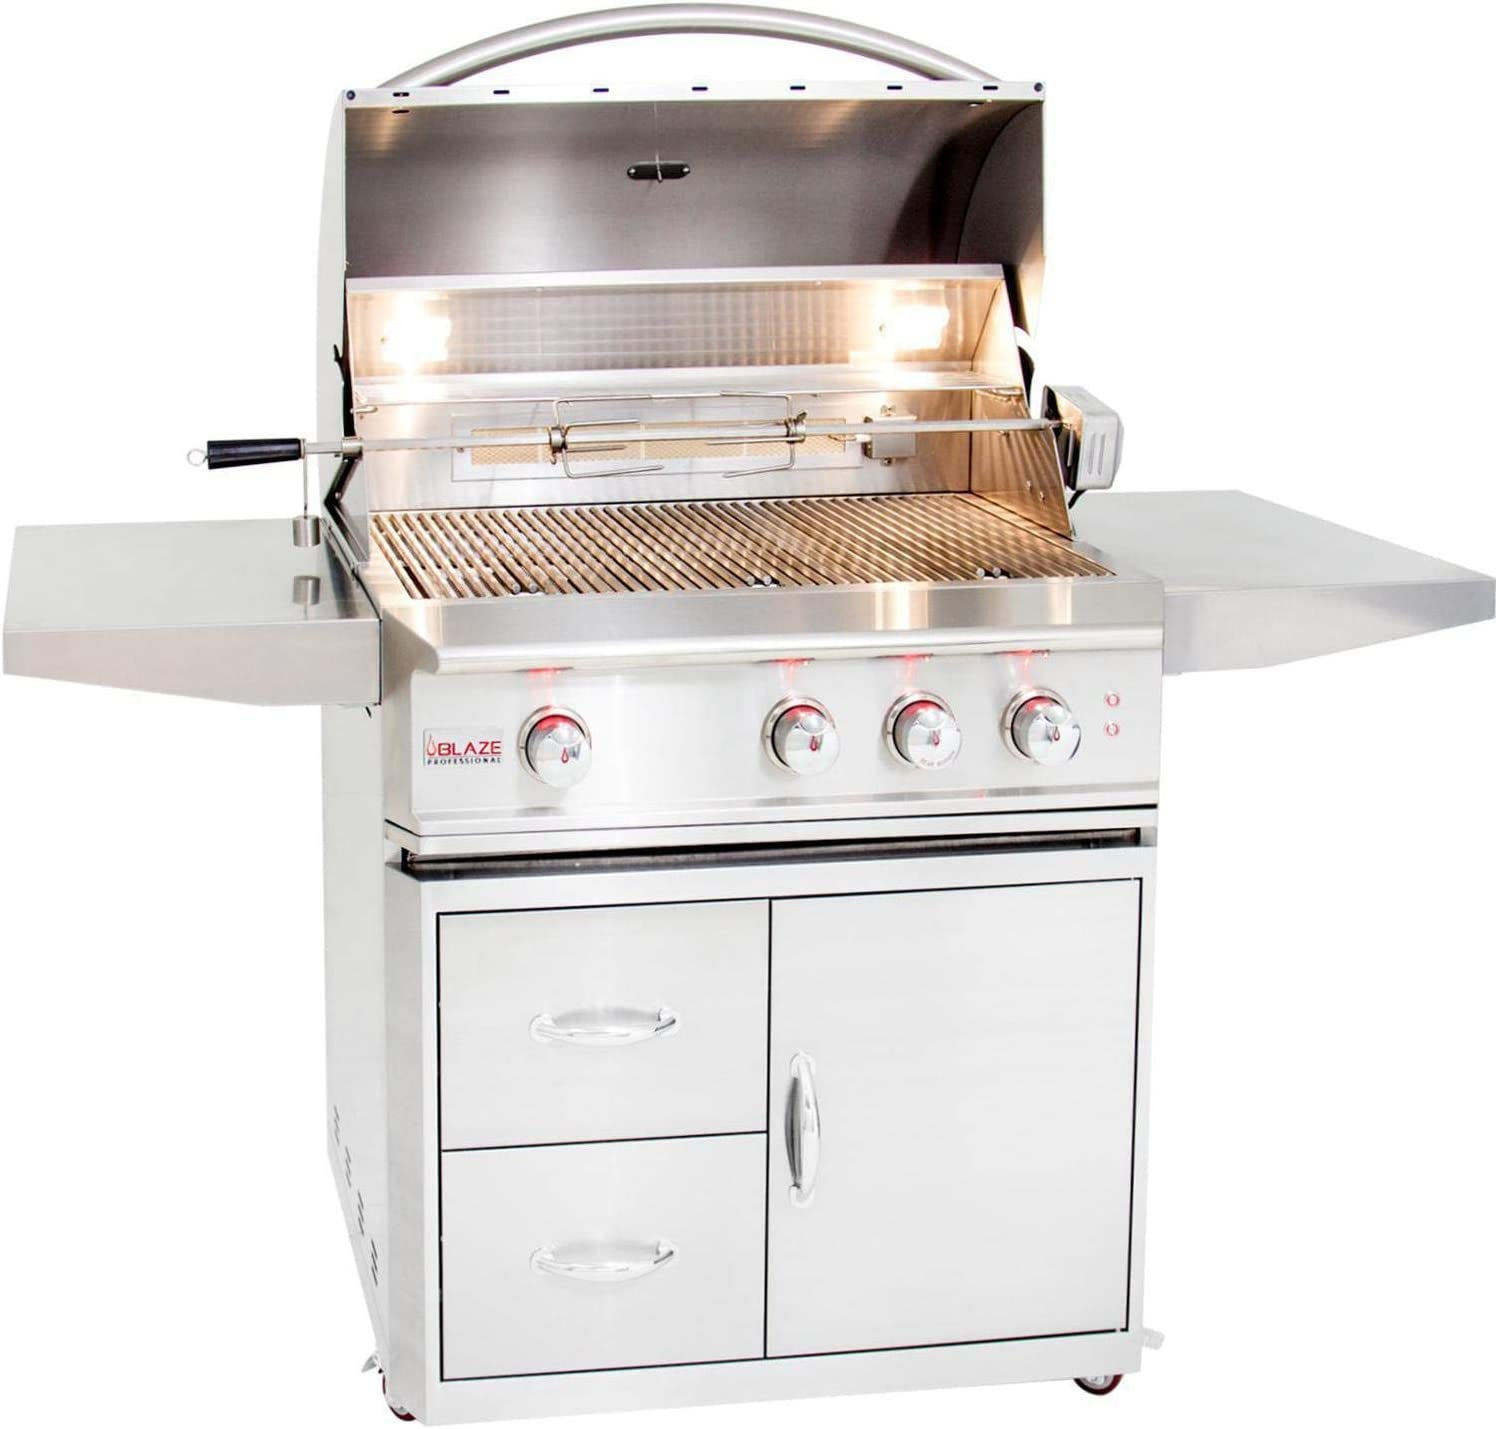 Blaze Professional 3-burner Natural Gas Grill With Rear Infrared Burner On Cart